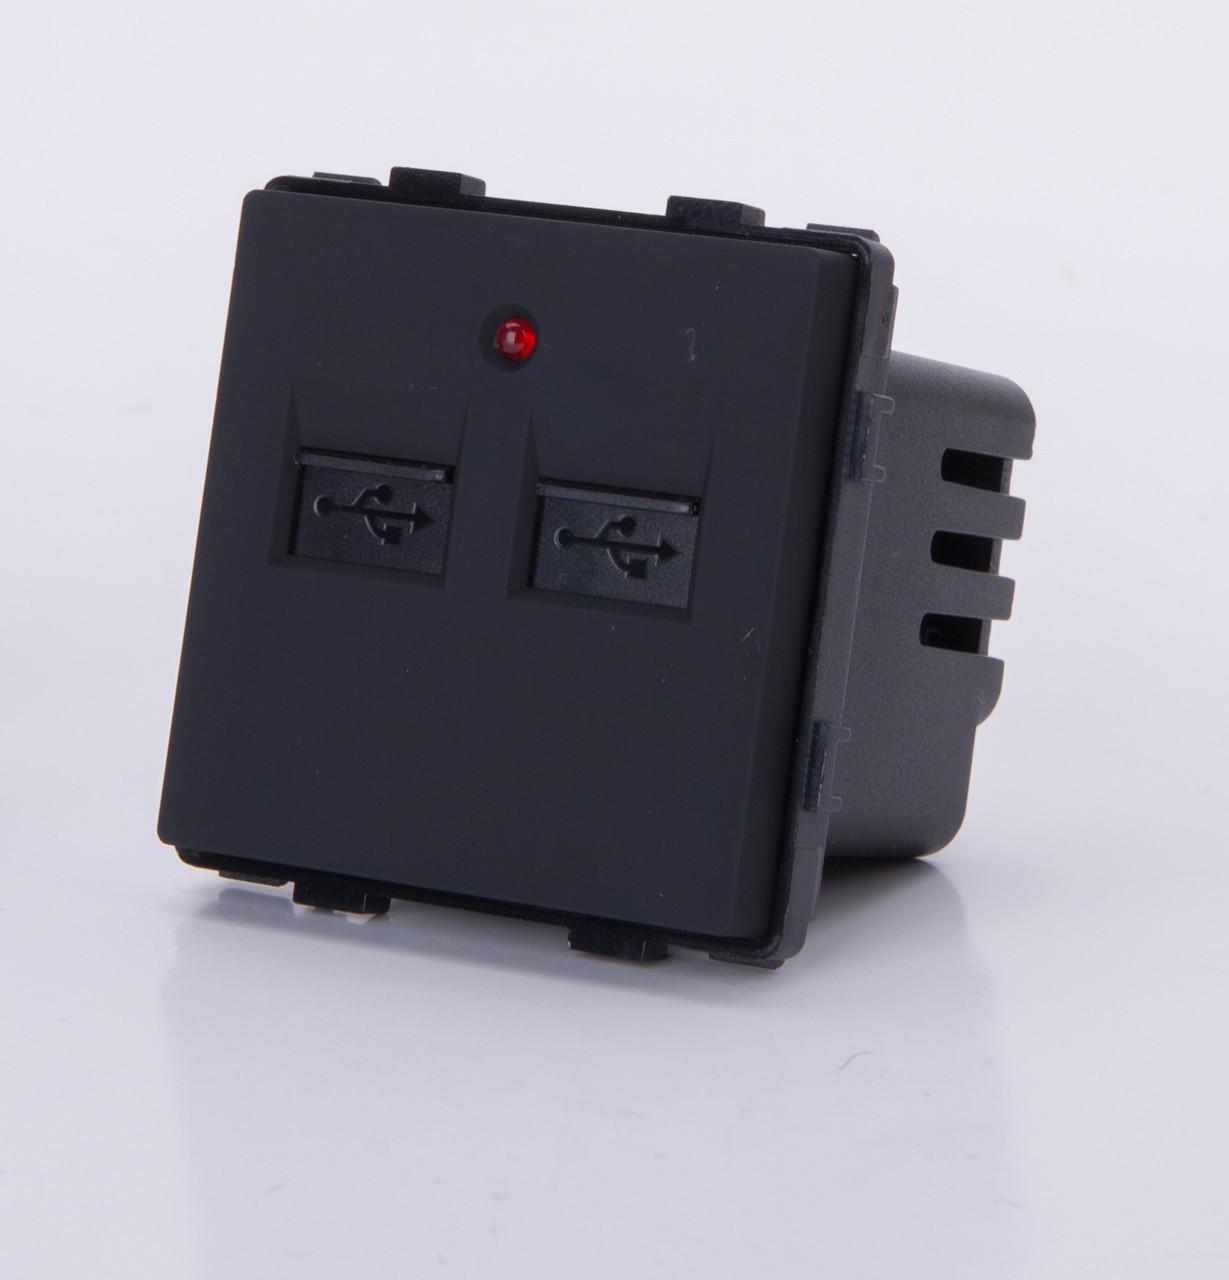 Модуль-USB розетка. Черный.